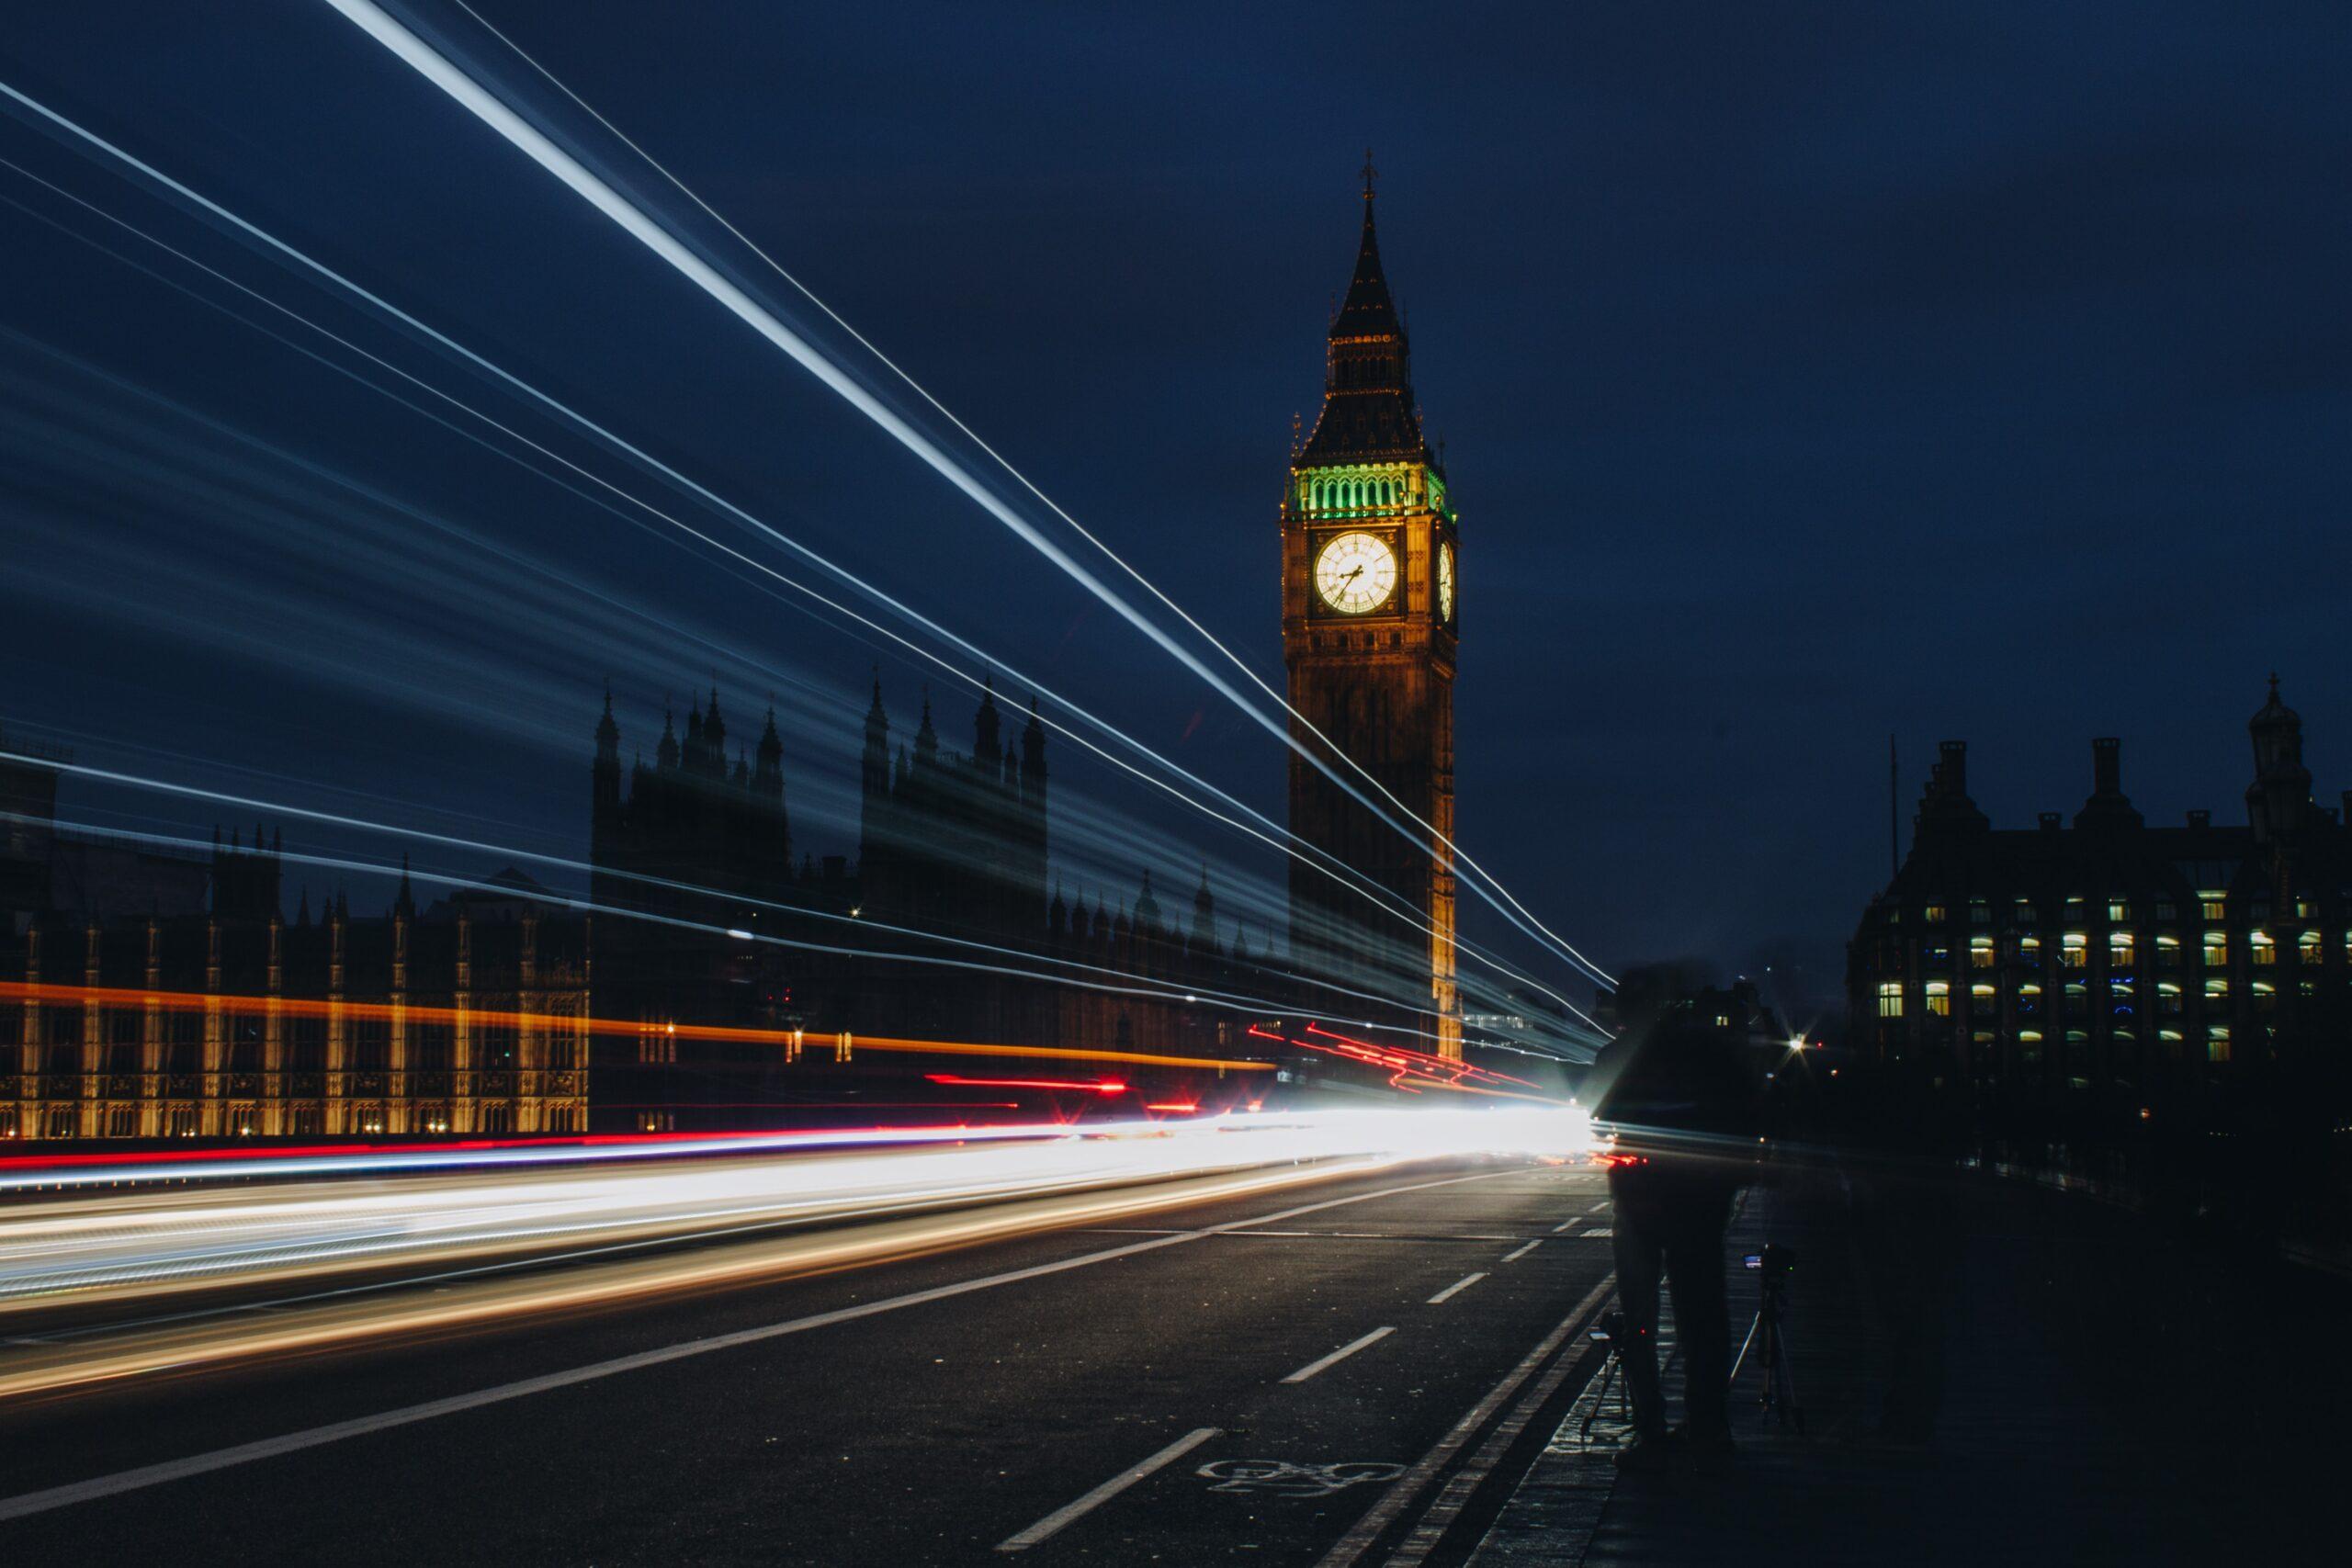 louis-k-London at night car lights over bridge sharp laser light-unsplash